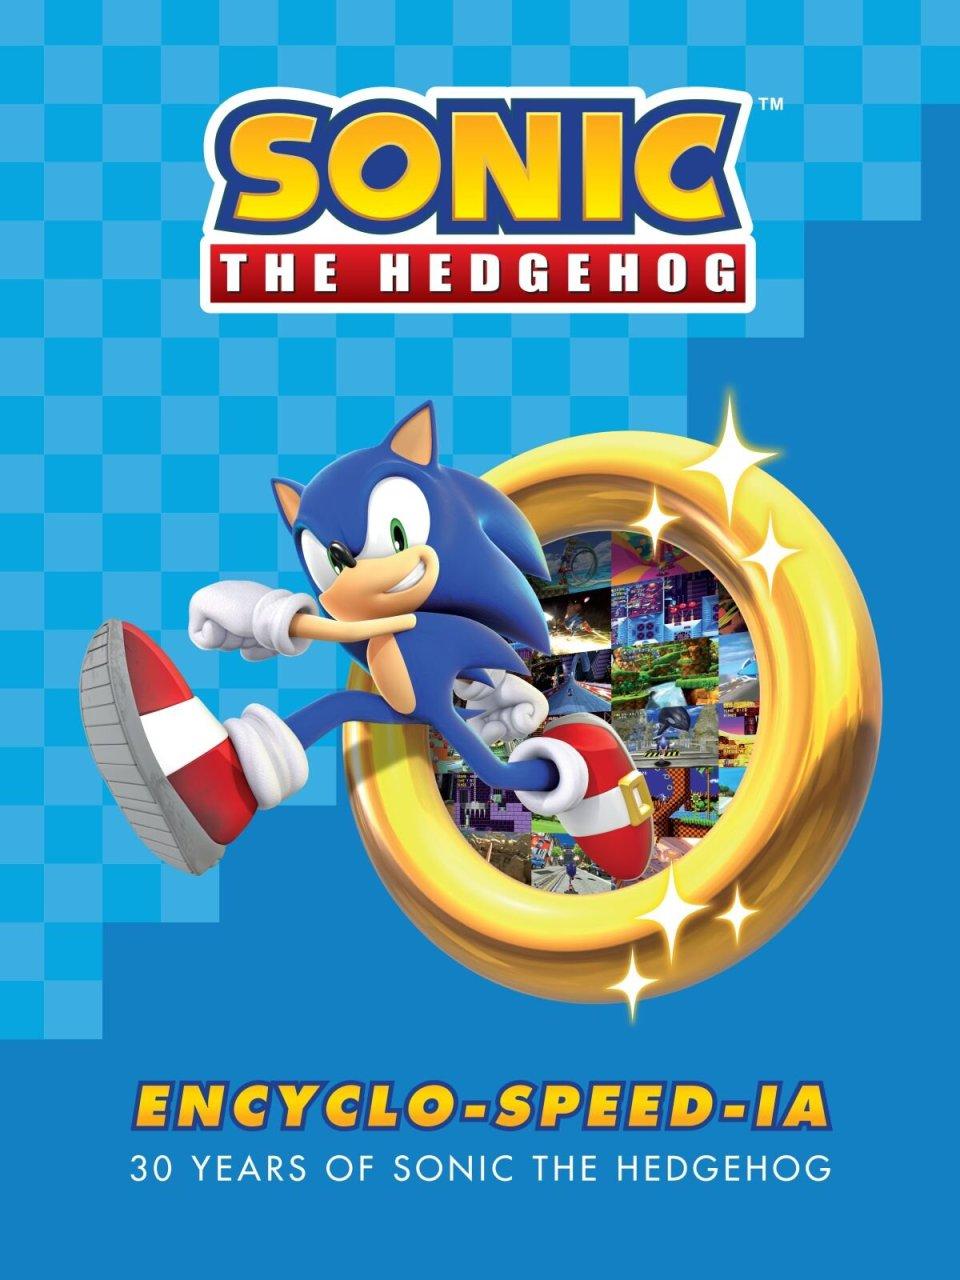 Sonic 30th Anniversary - NOT FINAL.jpg